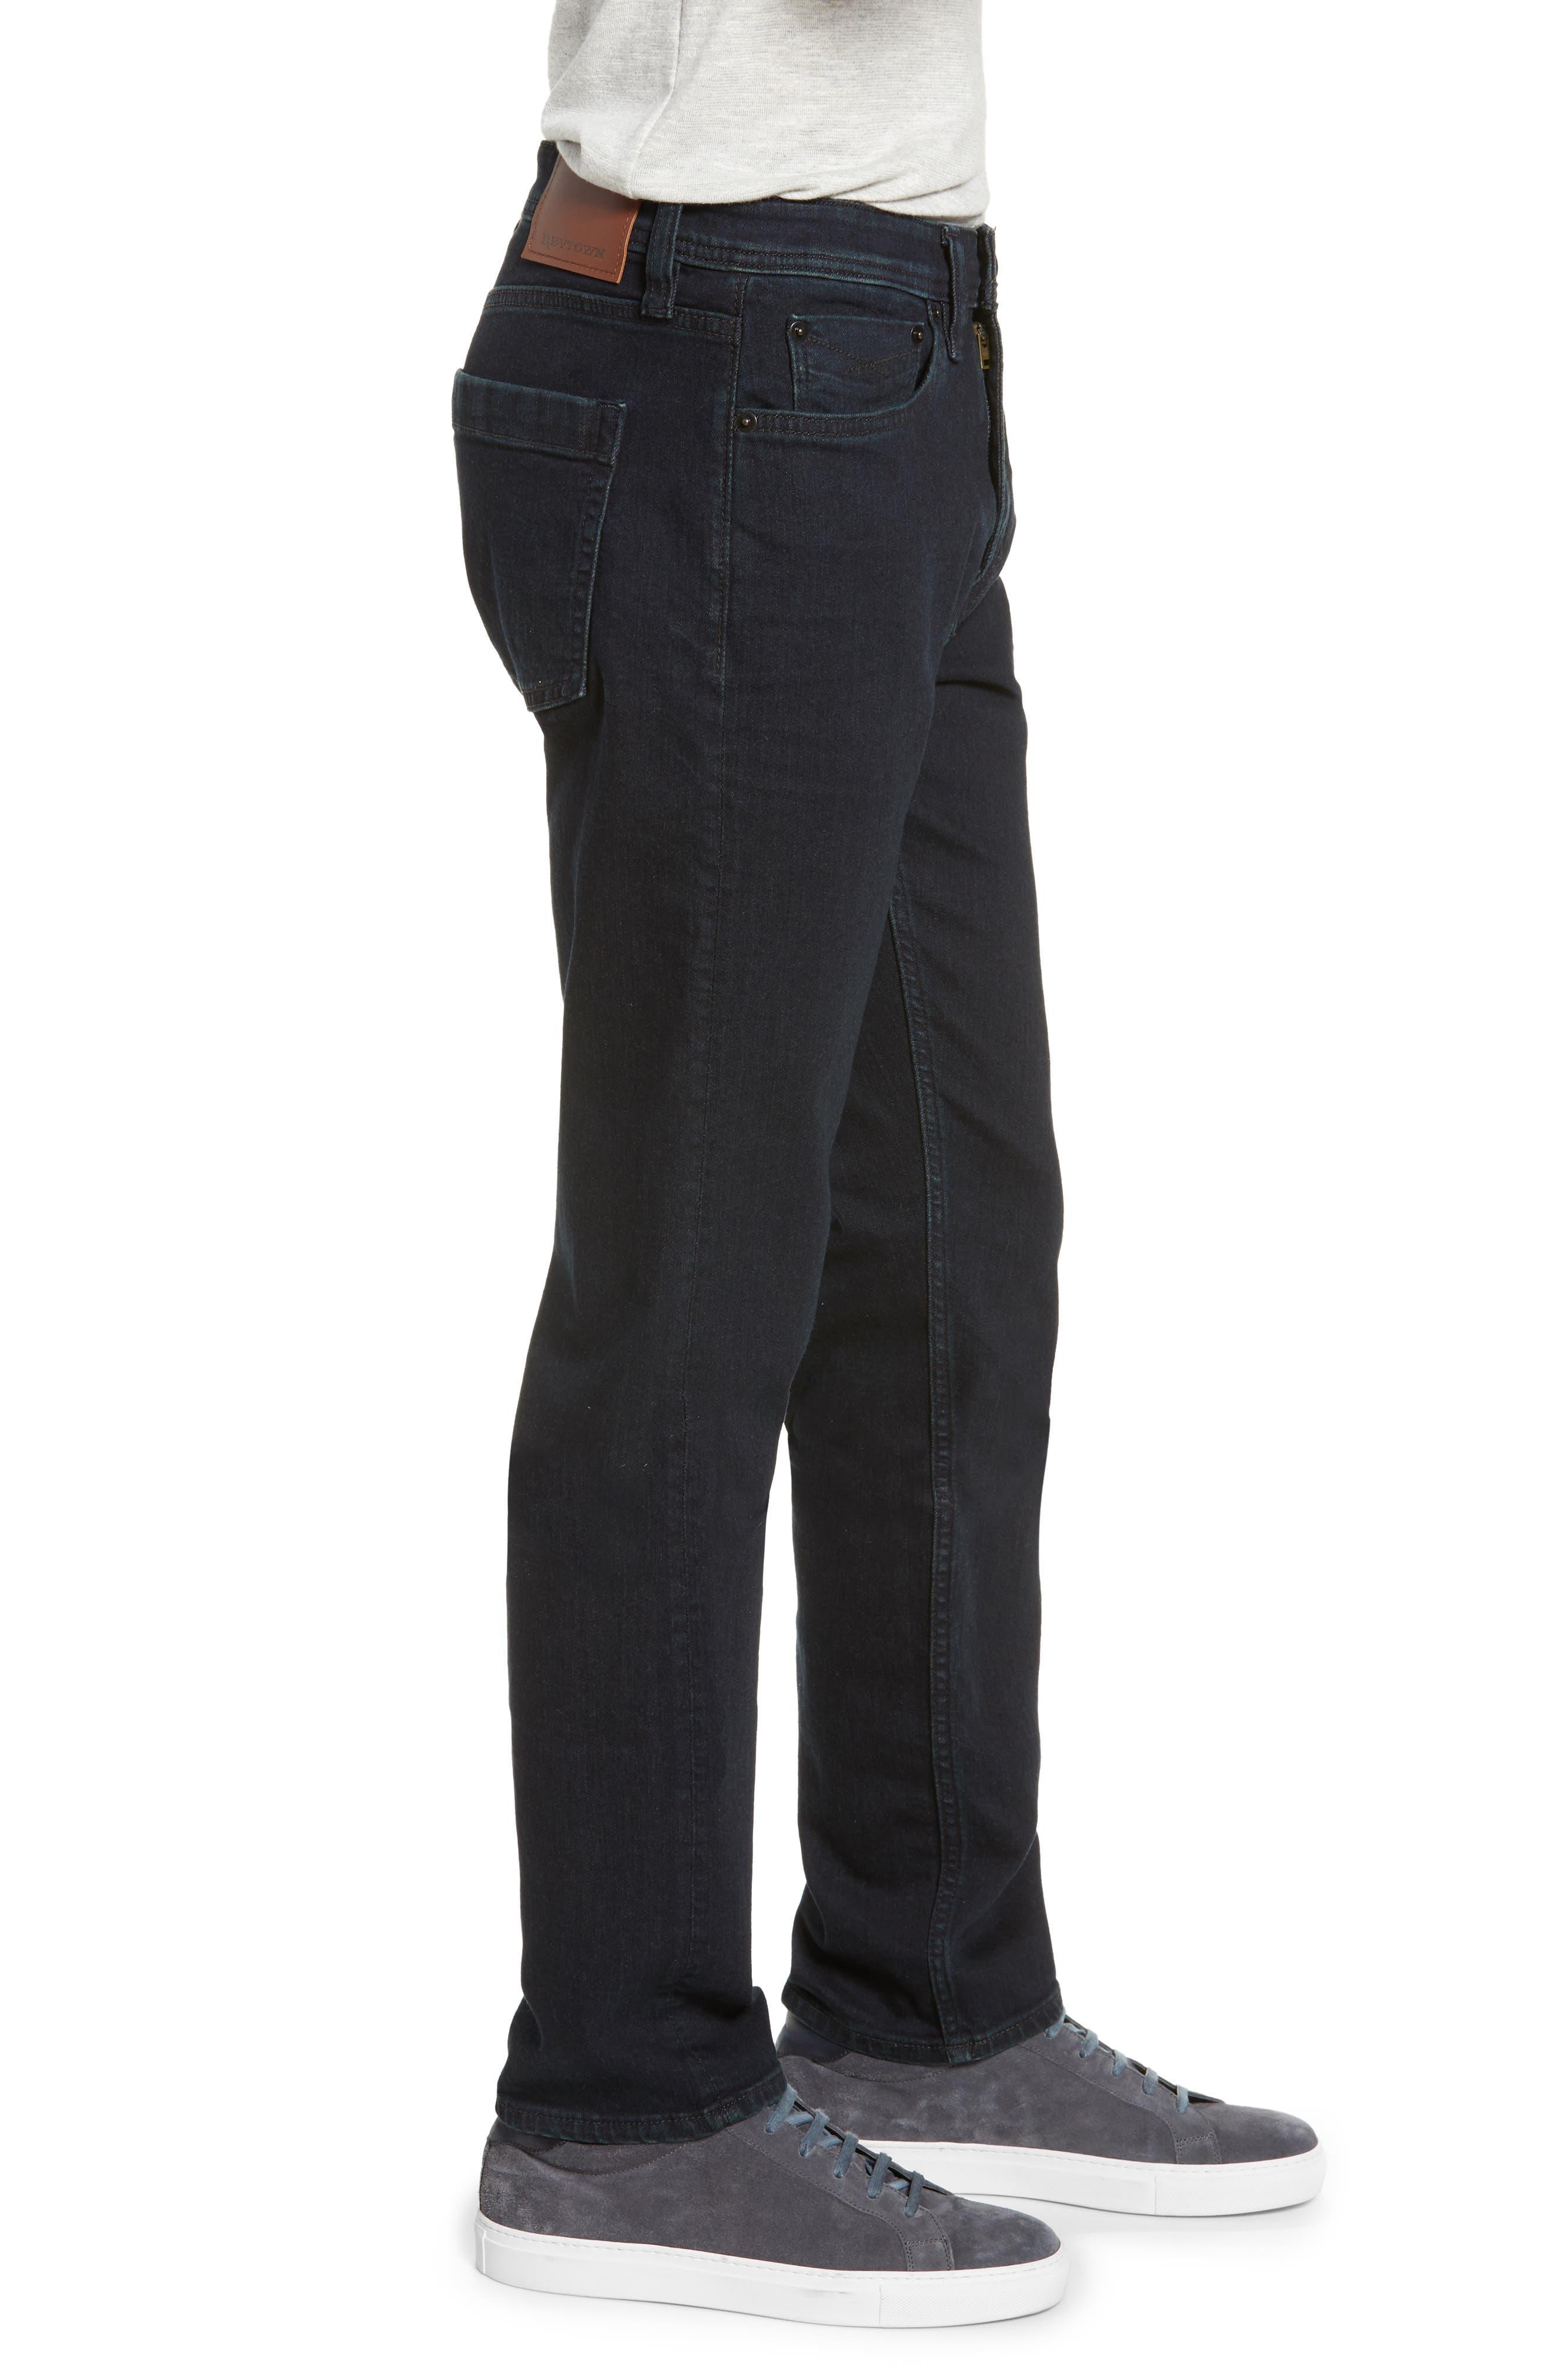 REVTOWN, Sharp Slim Fit Jeans, Alternate thumbnail 4, color, RINSE INDIGO